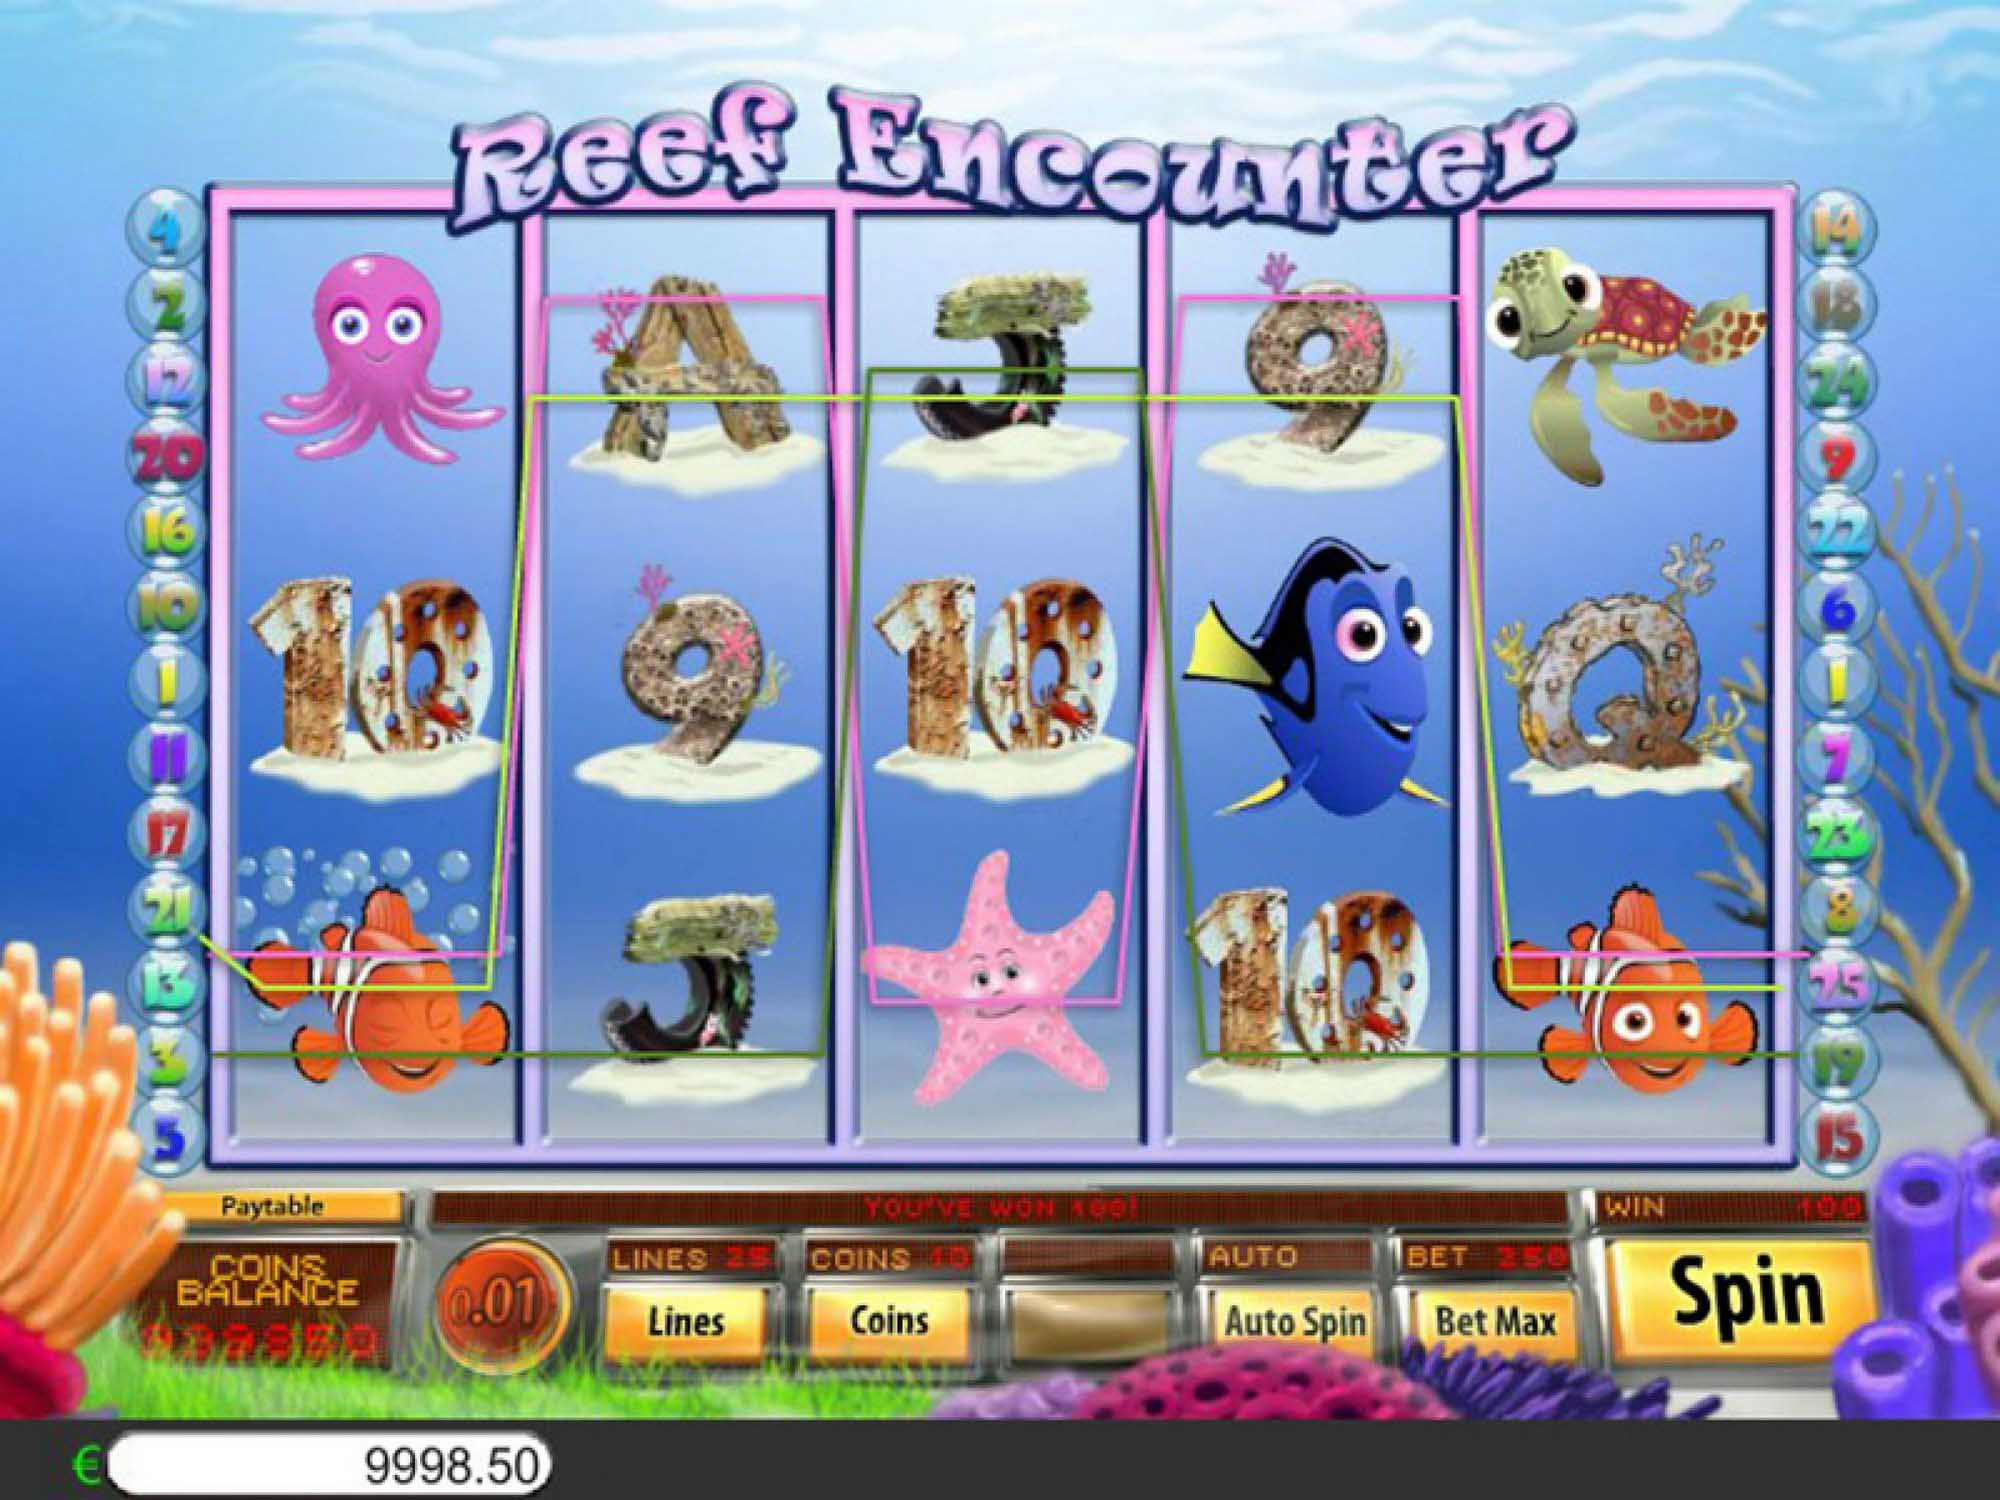 Reef Encounter Free Slots